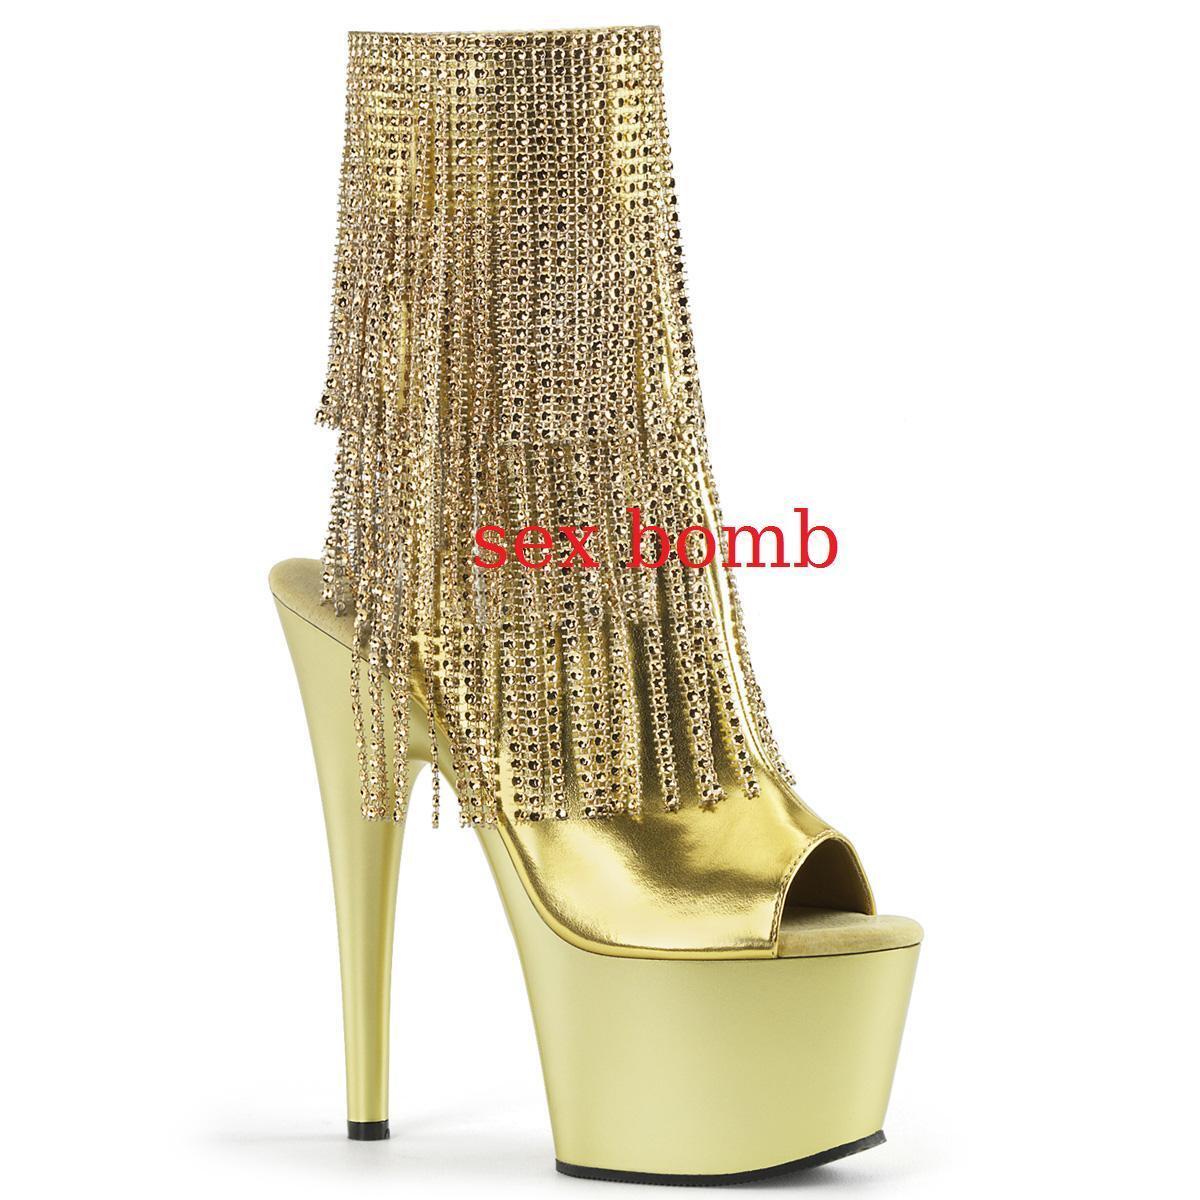 Sexy STIVALETTI FRANGE STRASS plateau spuntati tacco 18 dal 35 al 40 Gold glamour